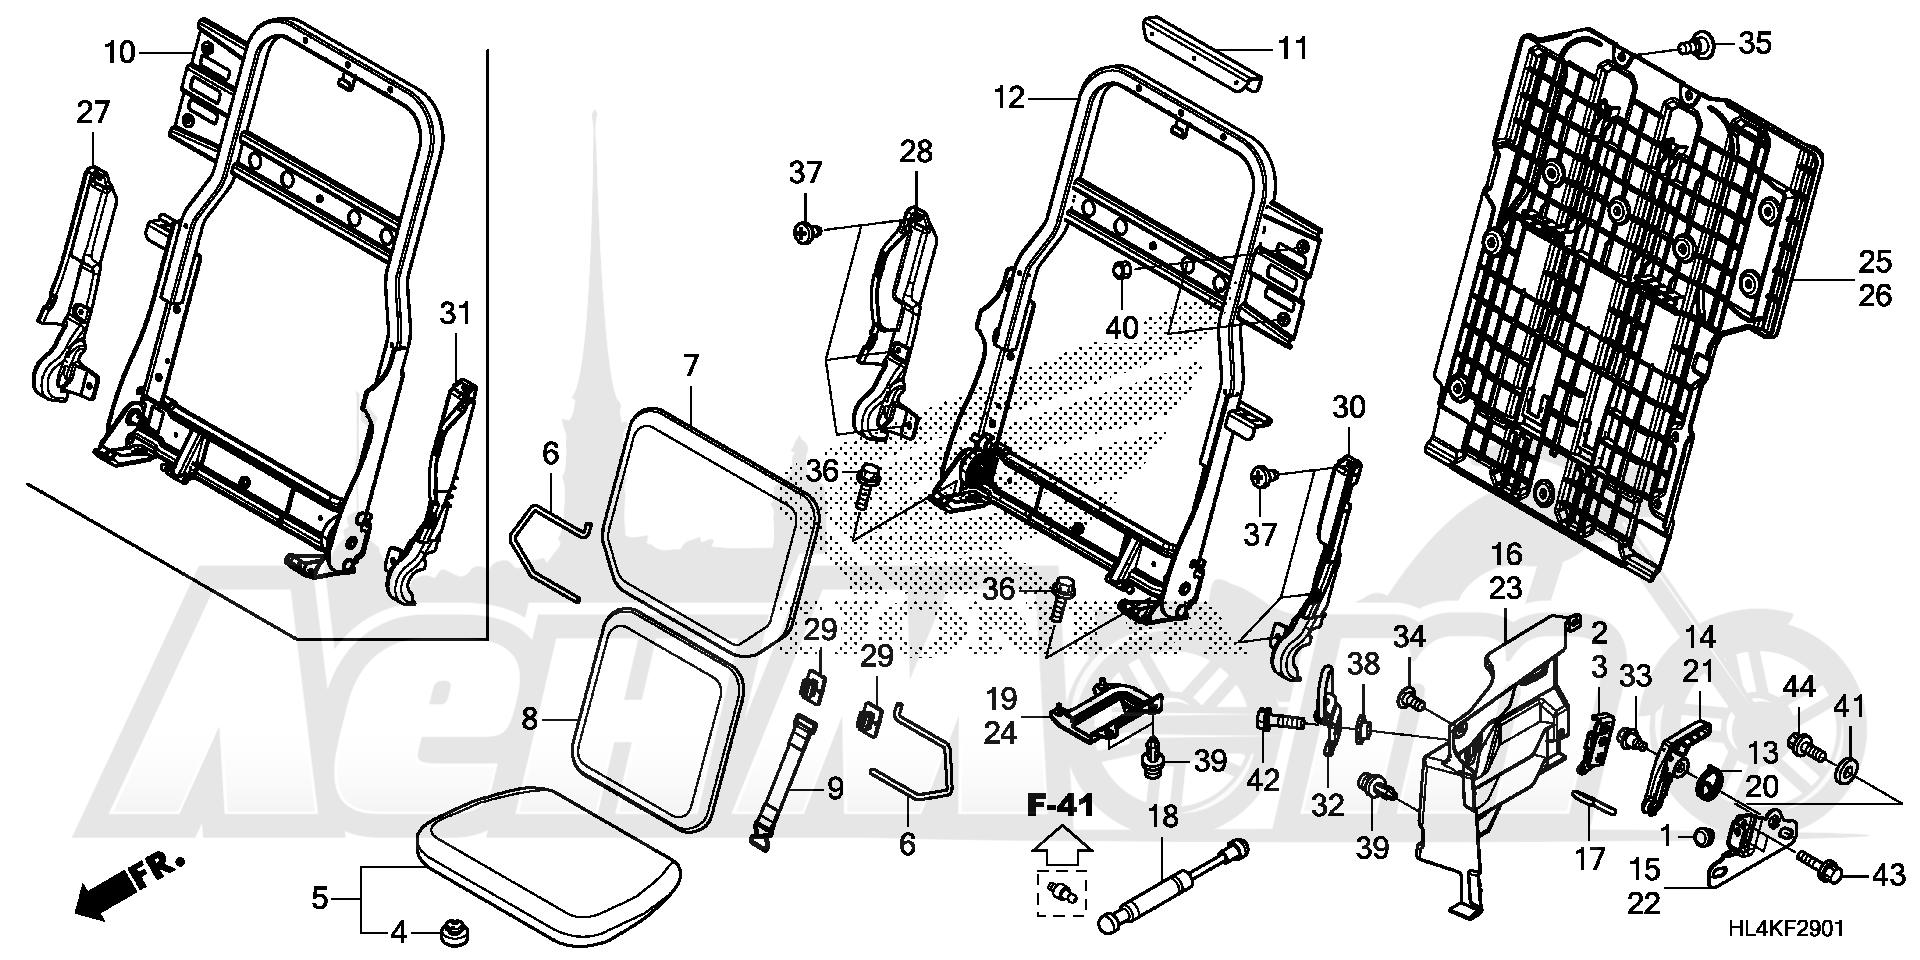 Запчасти для Квадроцикла Honda 2019 SXS1000M3L Раздел: REAR SEAT | зад сиденье